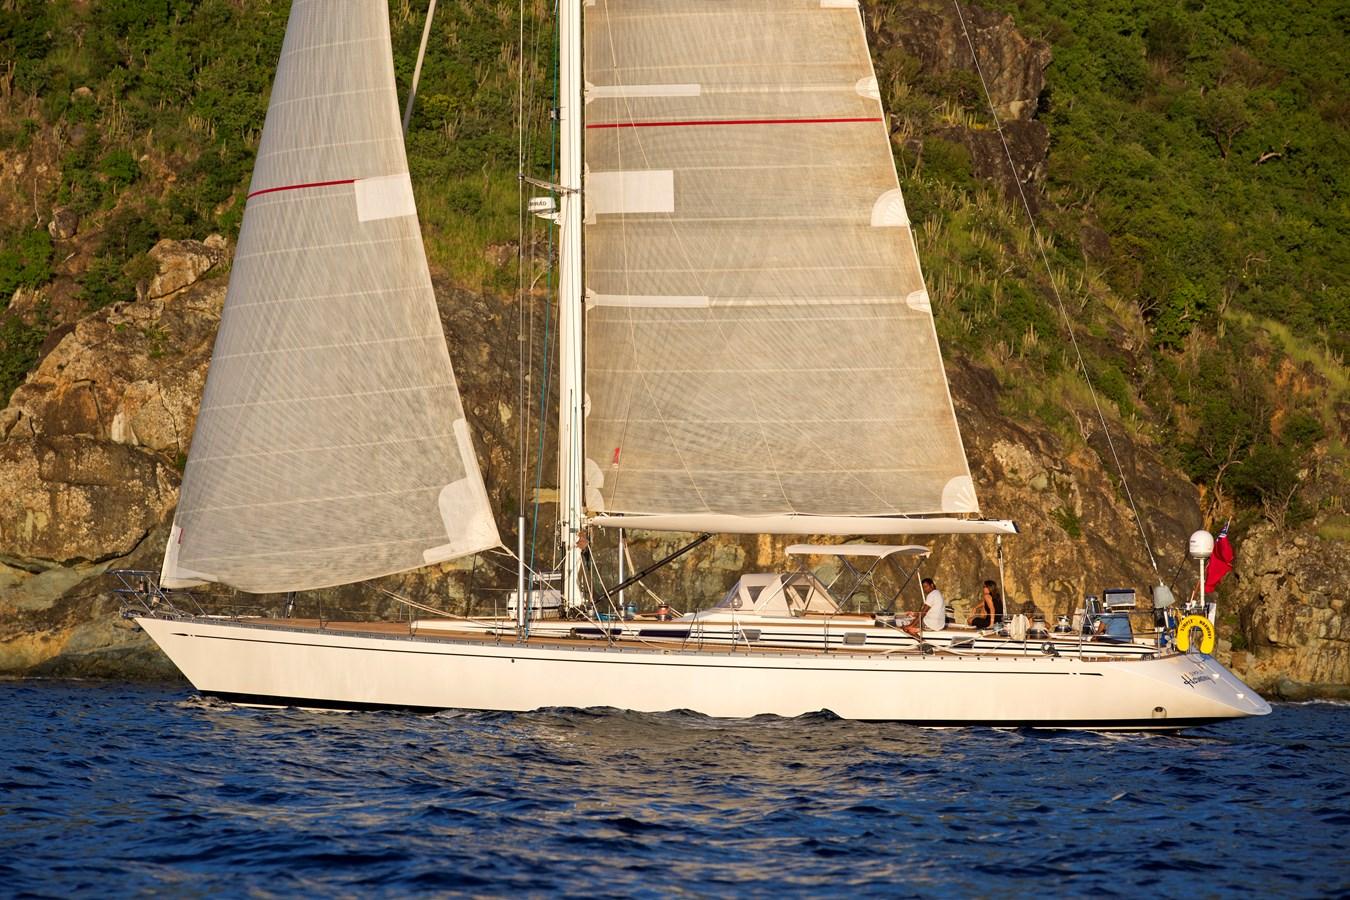 121314BTSC-1577 3 SWAN SWAN 68 Cruising Sailboat 2586762